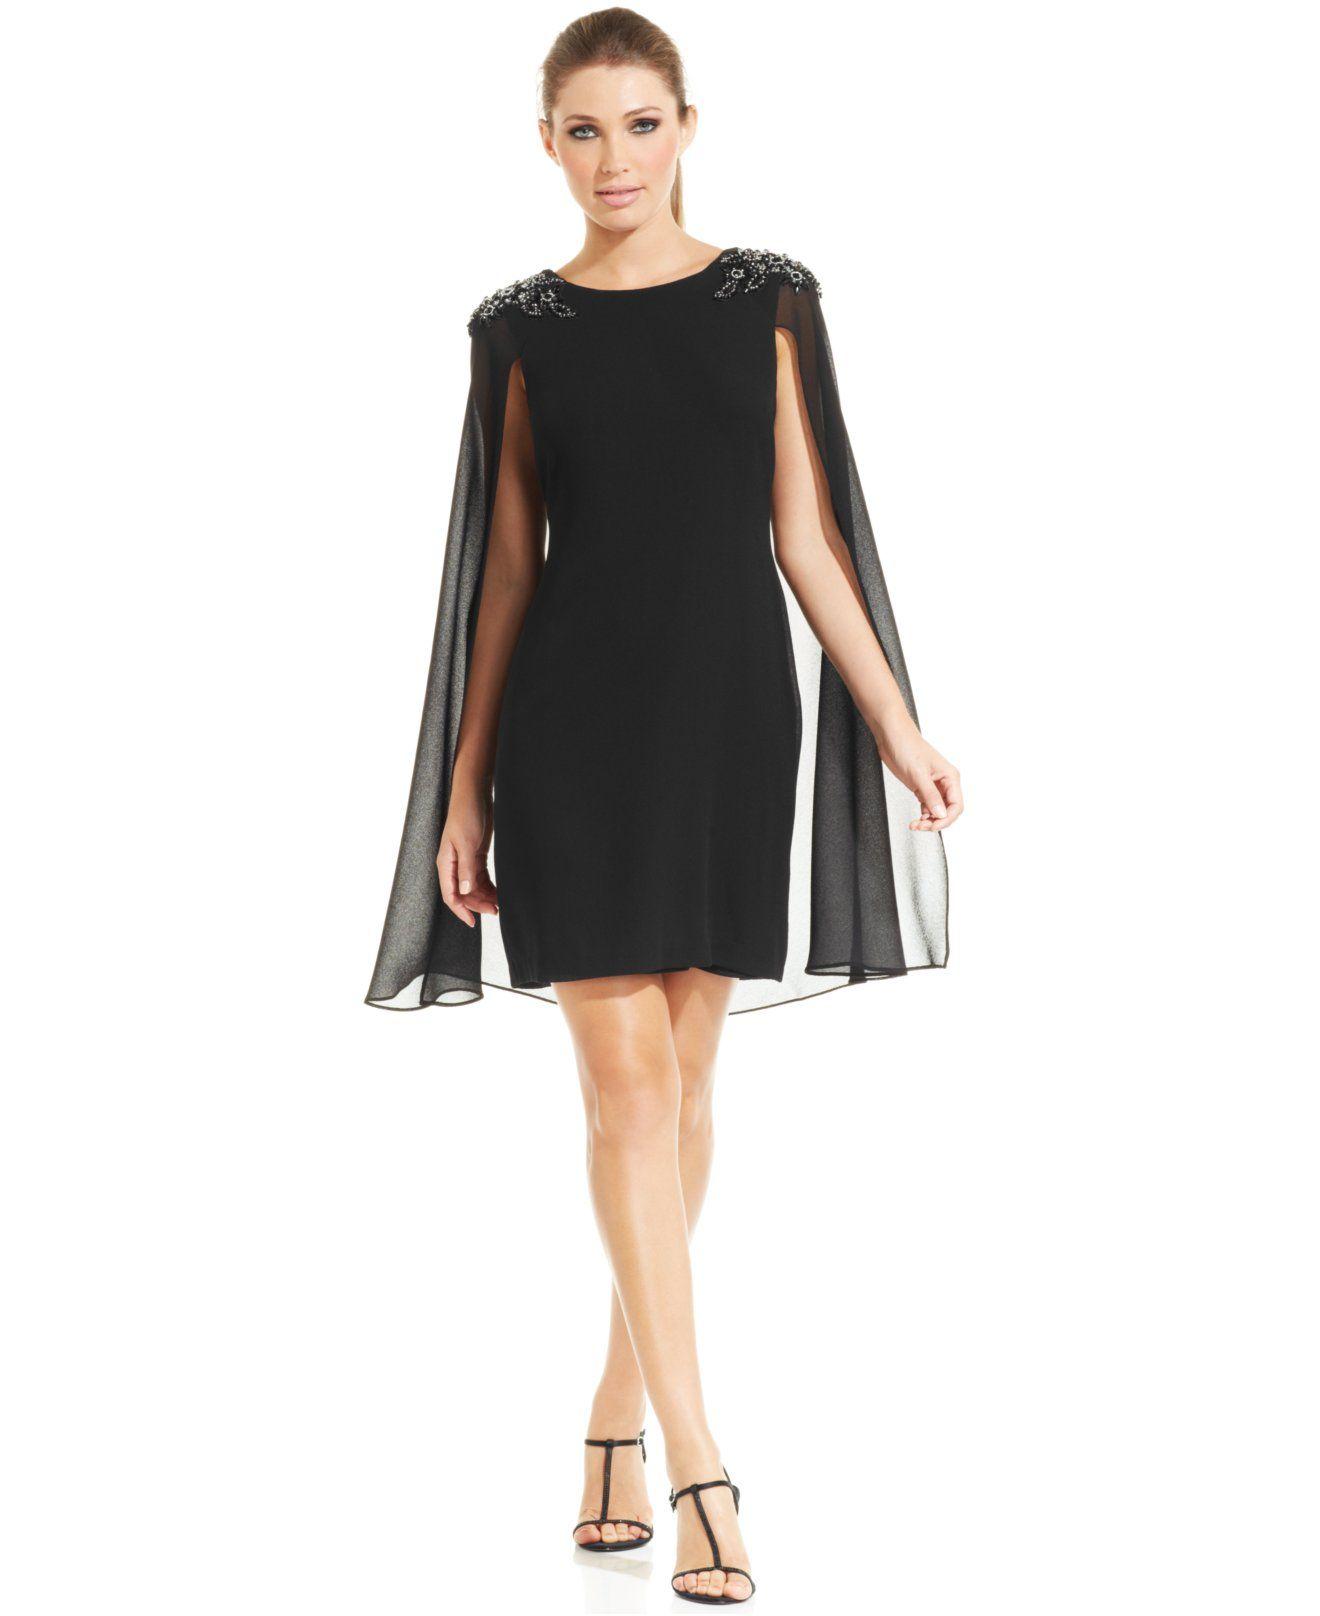 Xscape Embellished Chiffon Capelet Dress - Dresses - Women - Macy\'s ...